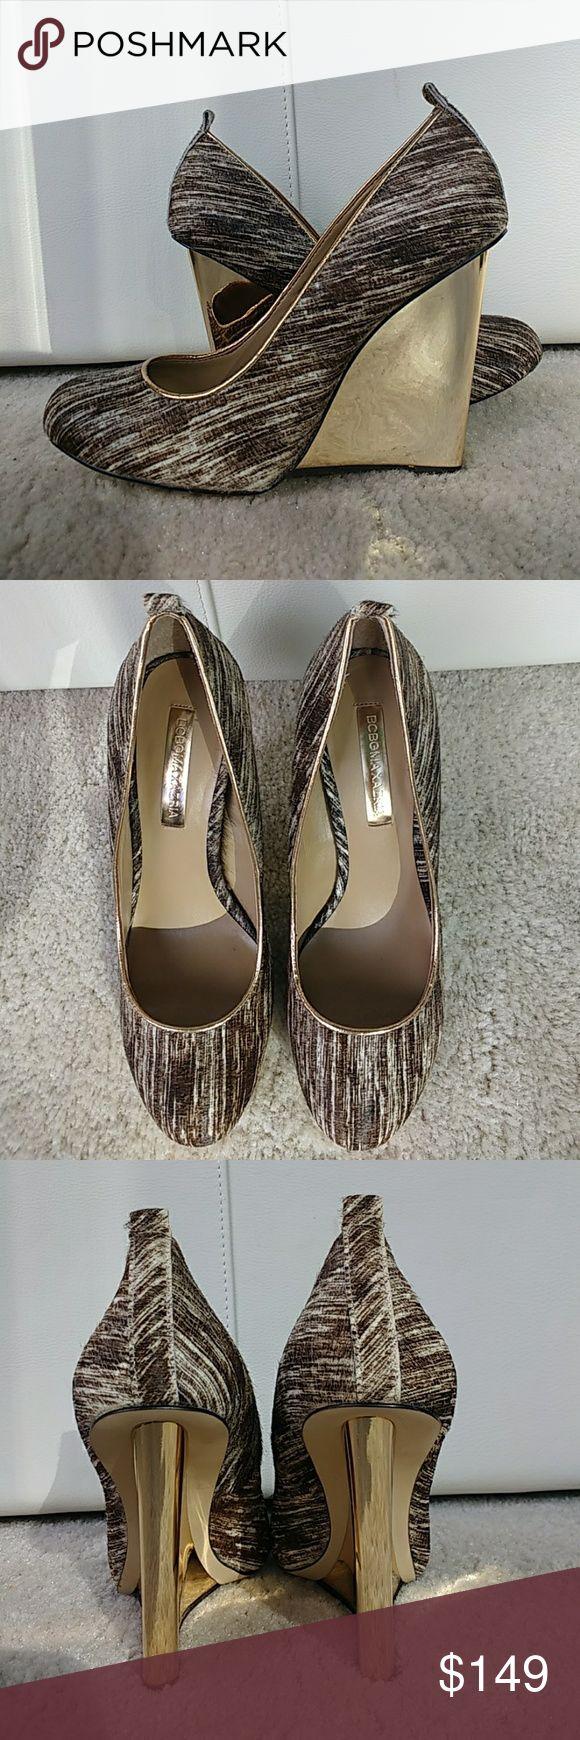 "NEW bcbg maxazria calf hair wedge pumps Adorable calf hair pumps with gold wedge heel   Almond toe  4.5"" high  Brand new in box never worn BCBGMaxAzria Shoes Wedges"